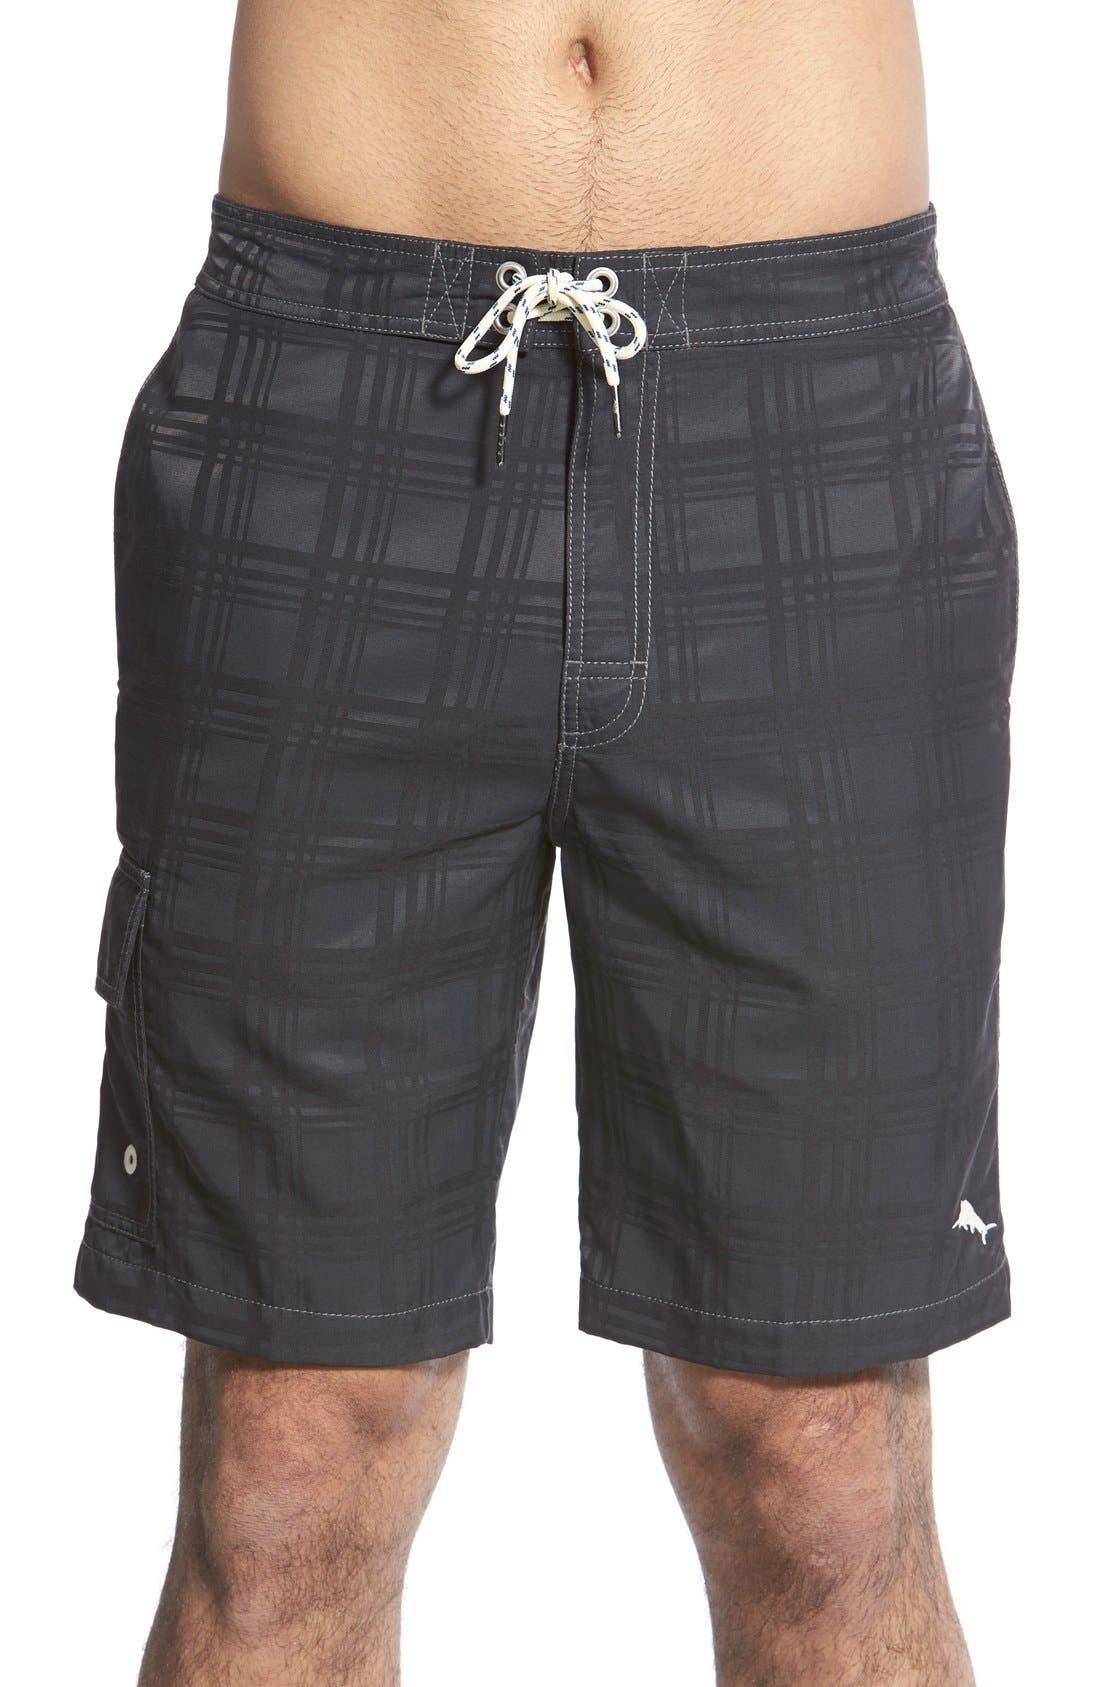 Tommy Bahama 'Baja Plaid' Board Shorts